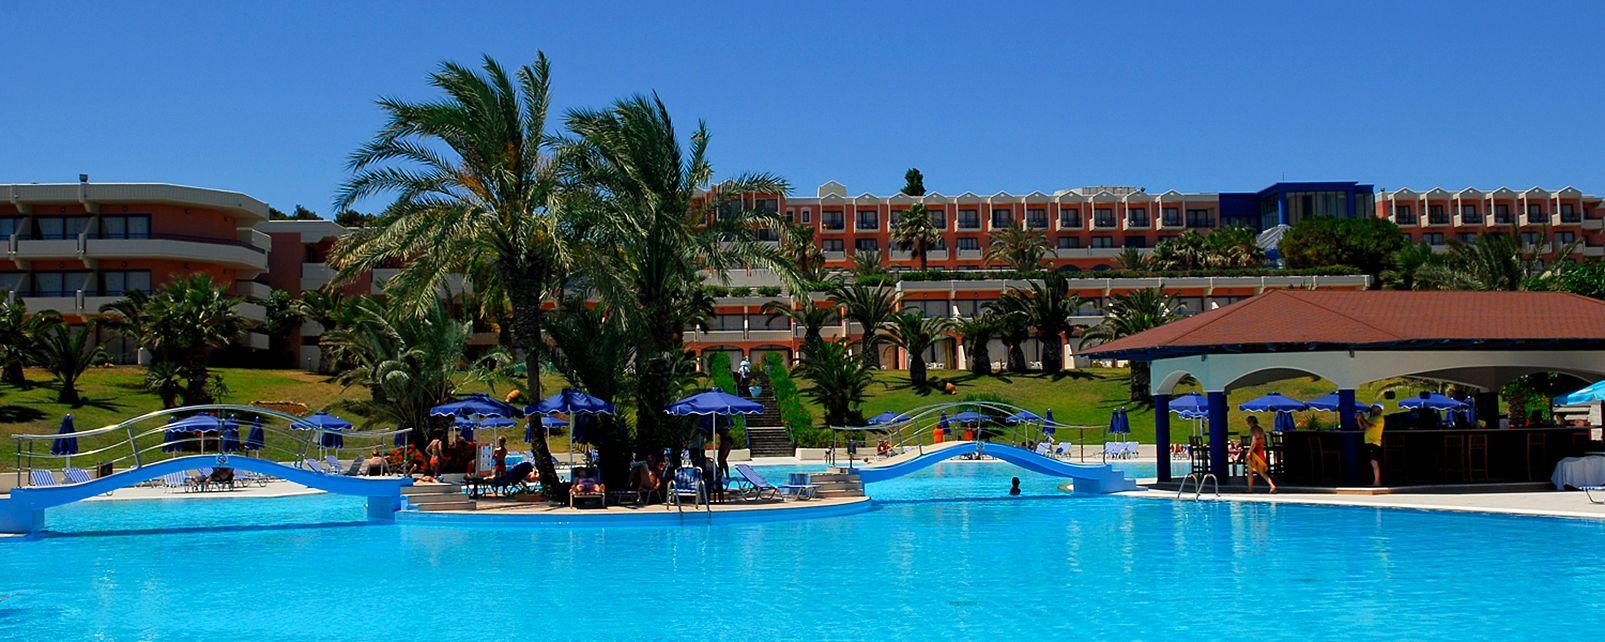 Hotel Kresten Palace Rhodos Kalithea